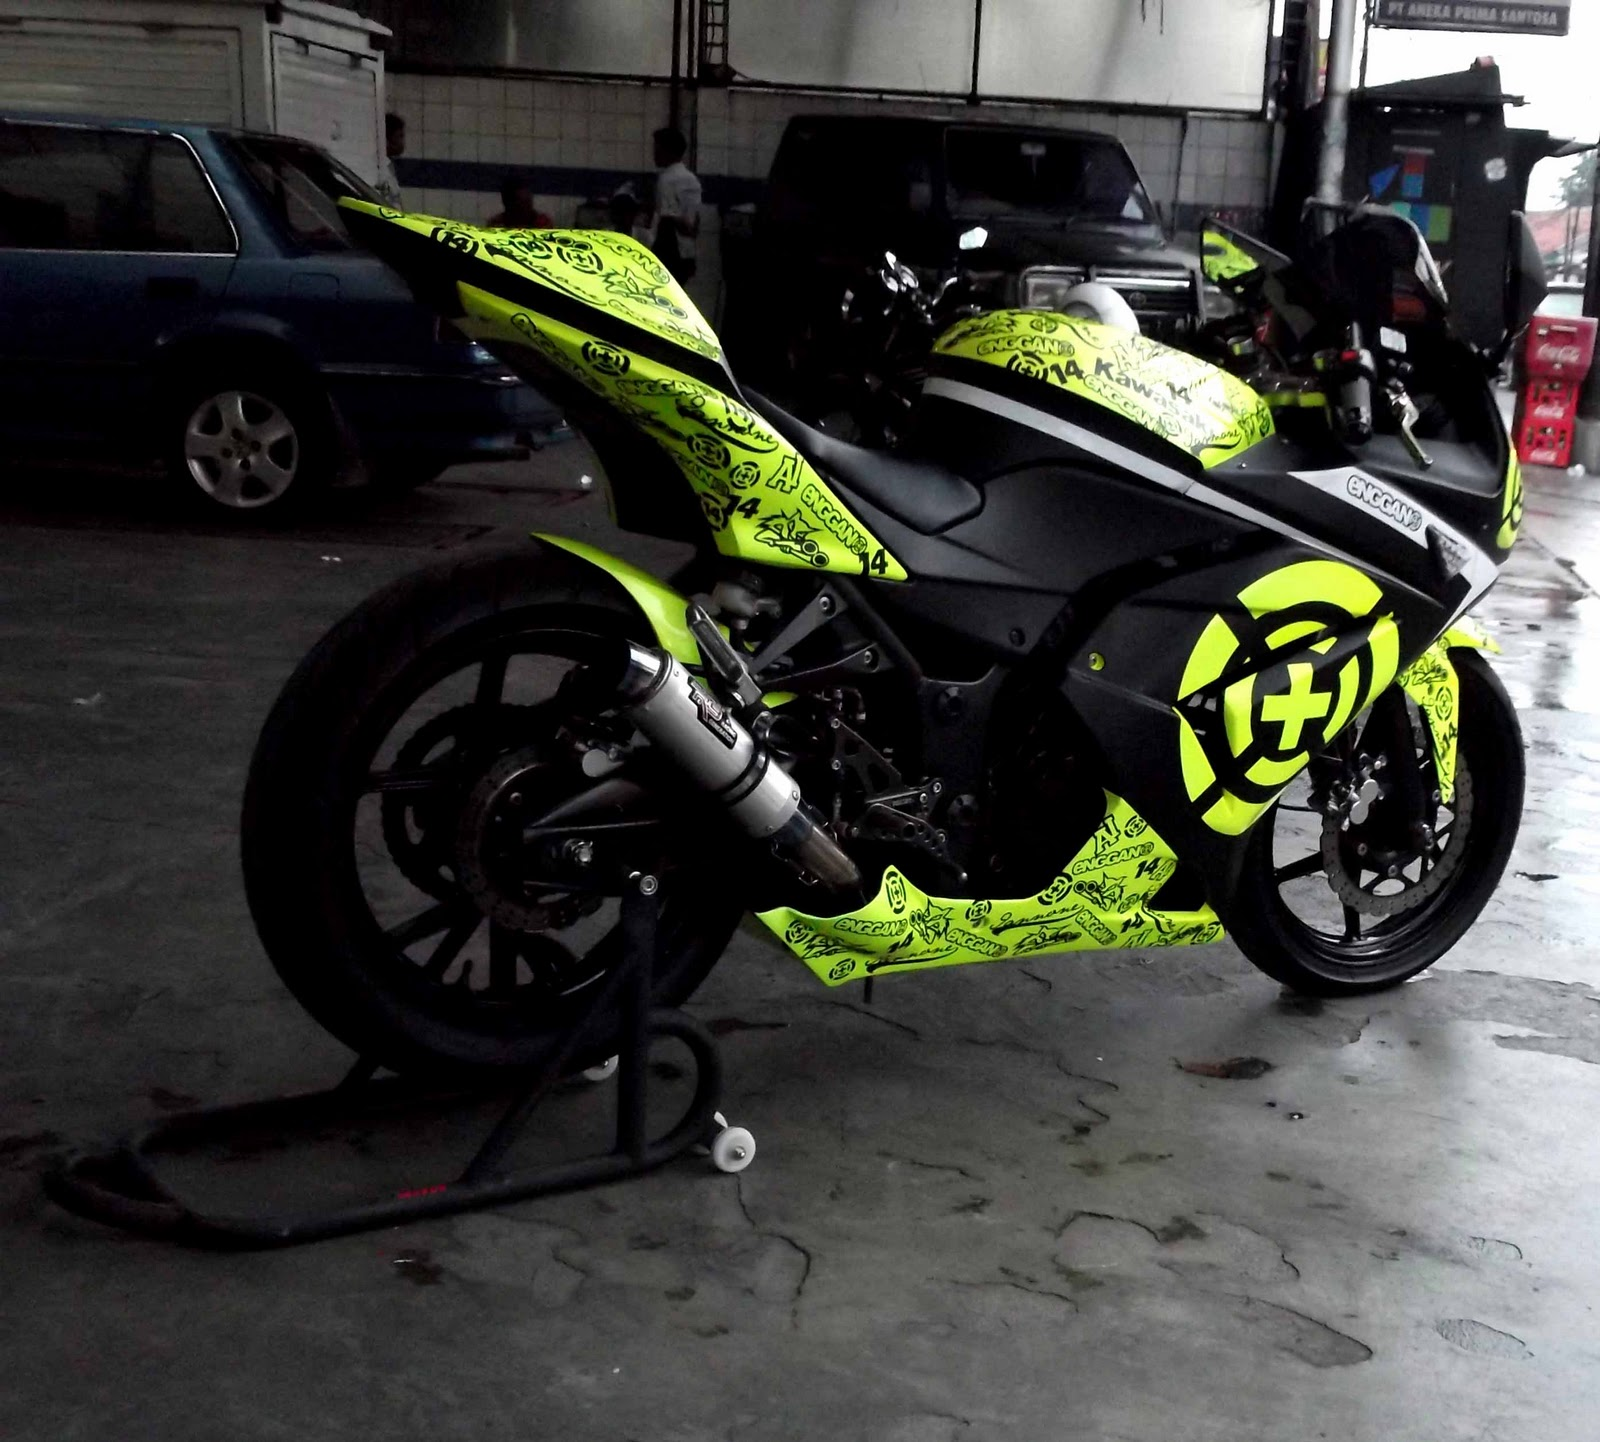 Design sticker ninja 250 - Ninja 250 Iannone Replika